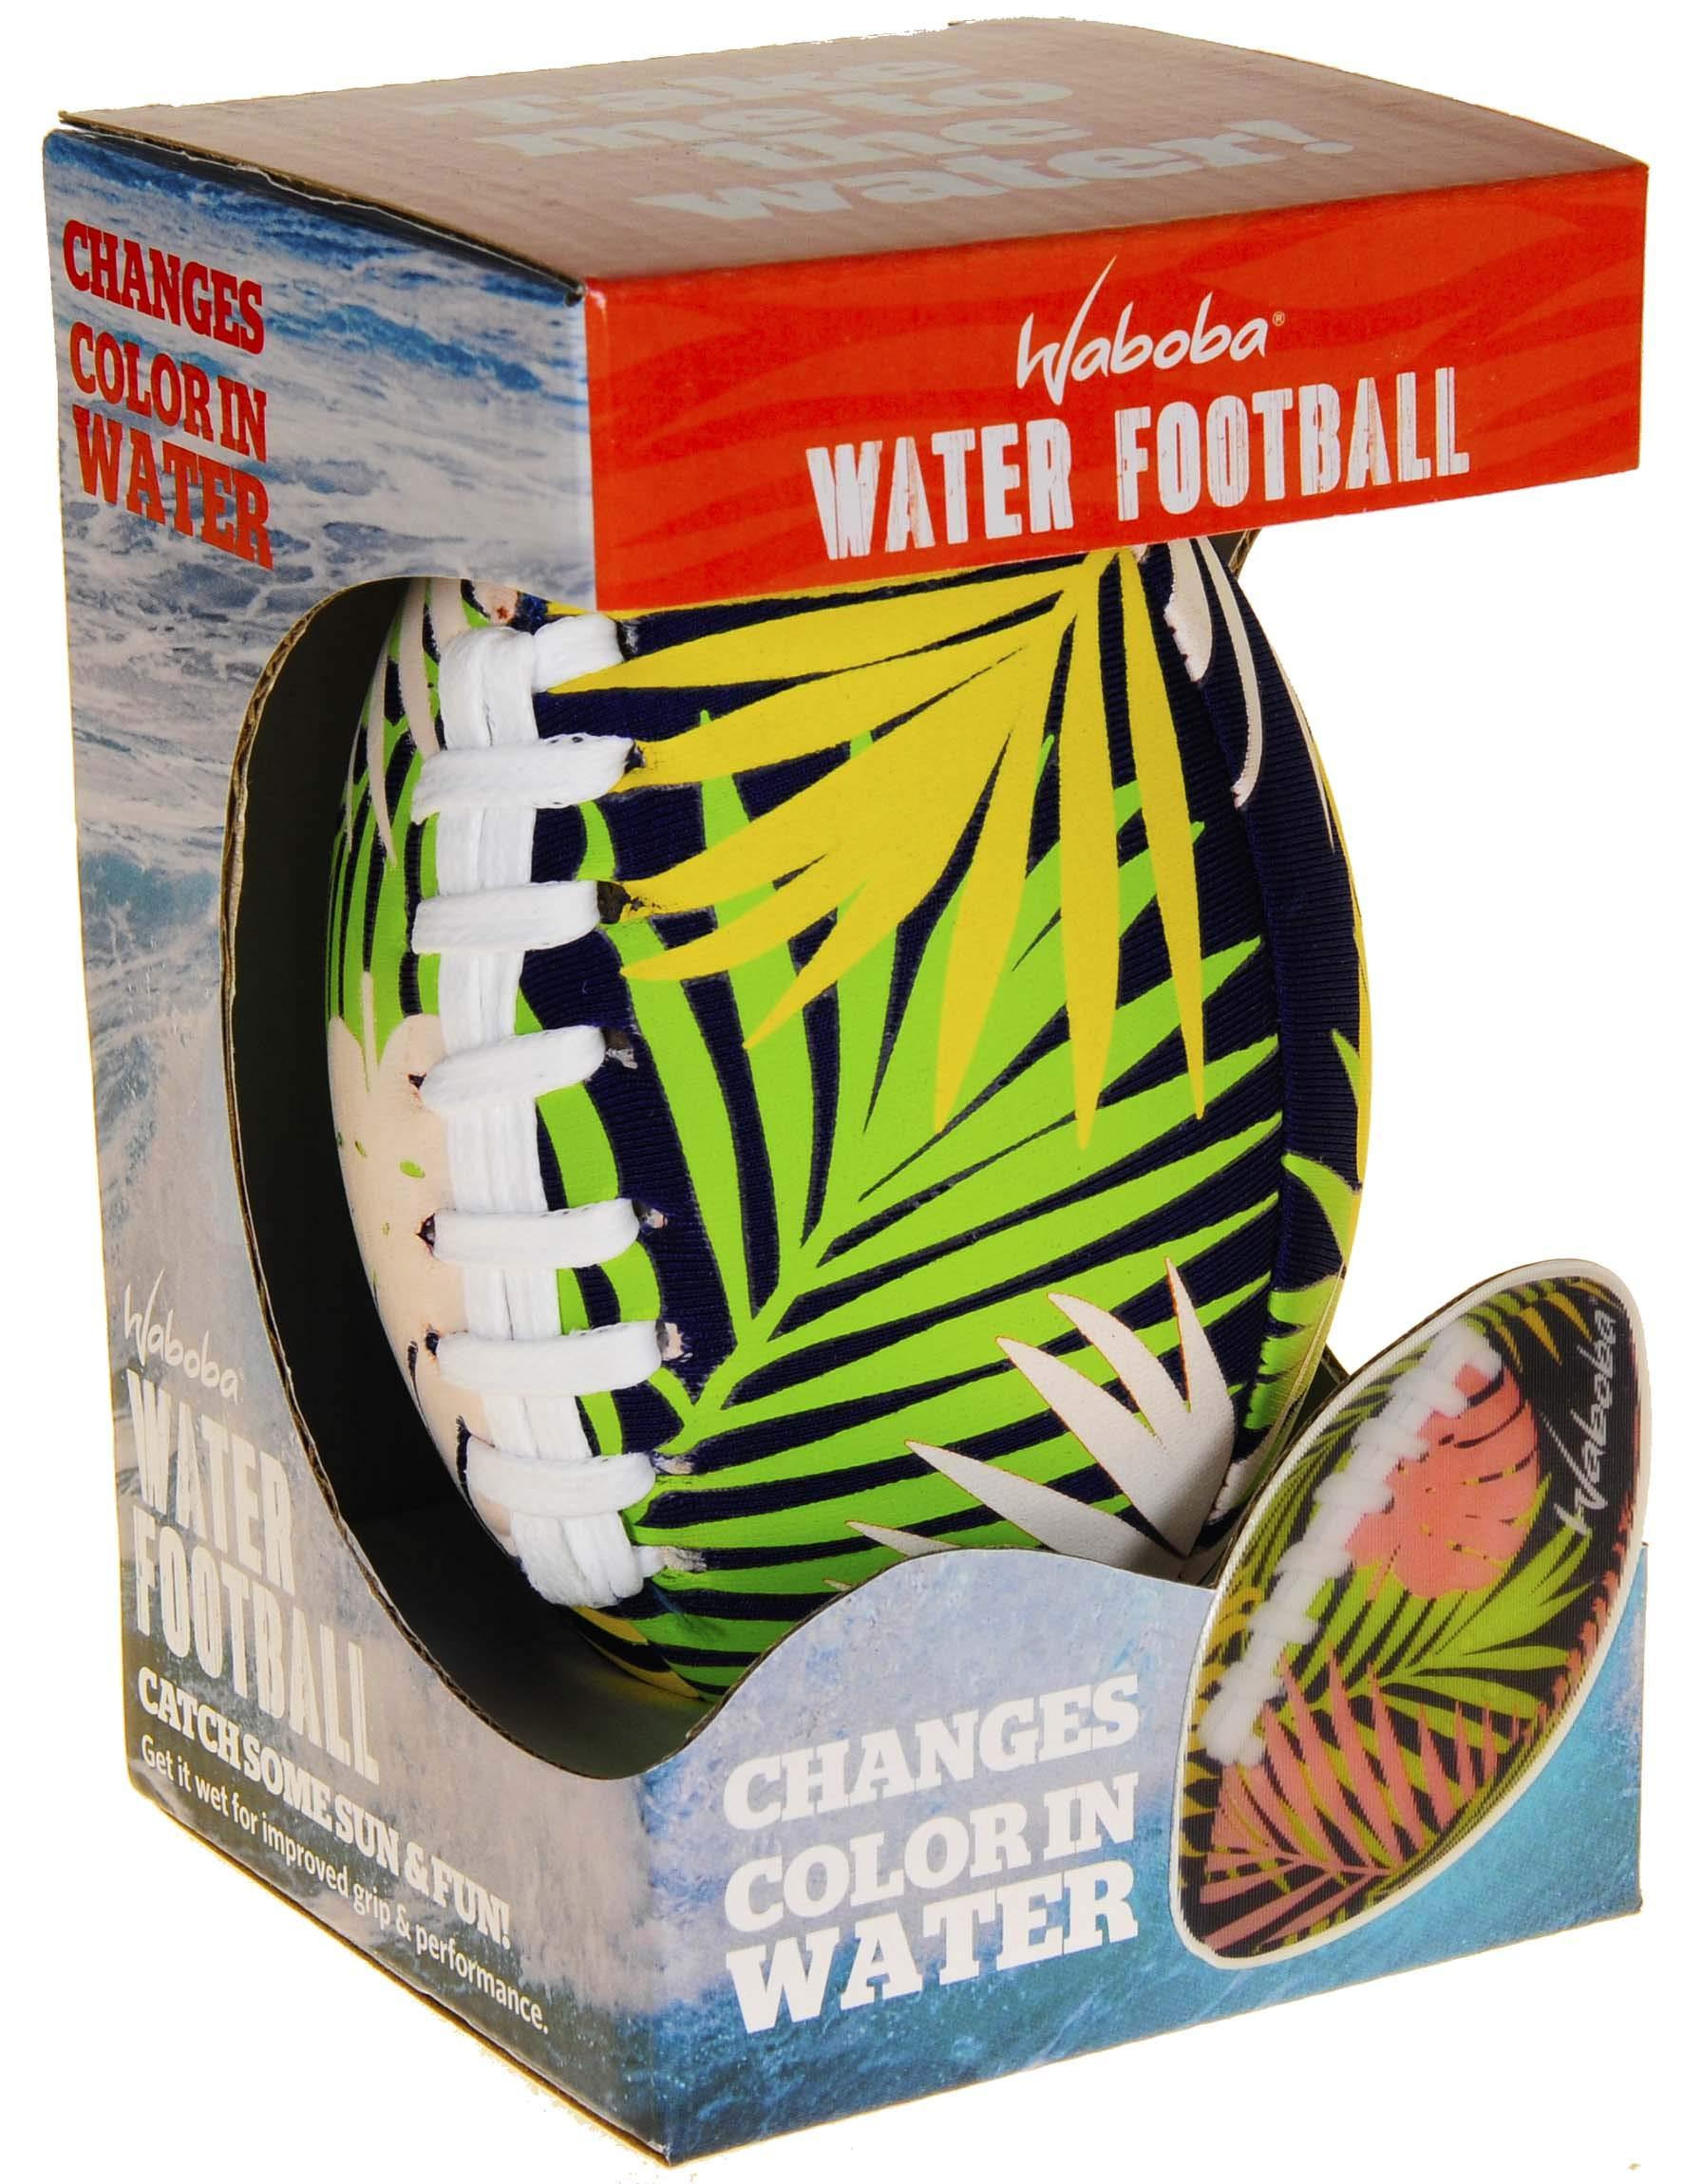 Waboba Color Changing Water Football 6'' // Bundle of 2 Footballs (Random Colors) // Bonus Blue Nylon Mesh Carry Bag// Bundled Items by Waboba (Image #6)